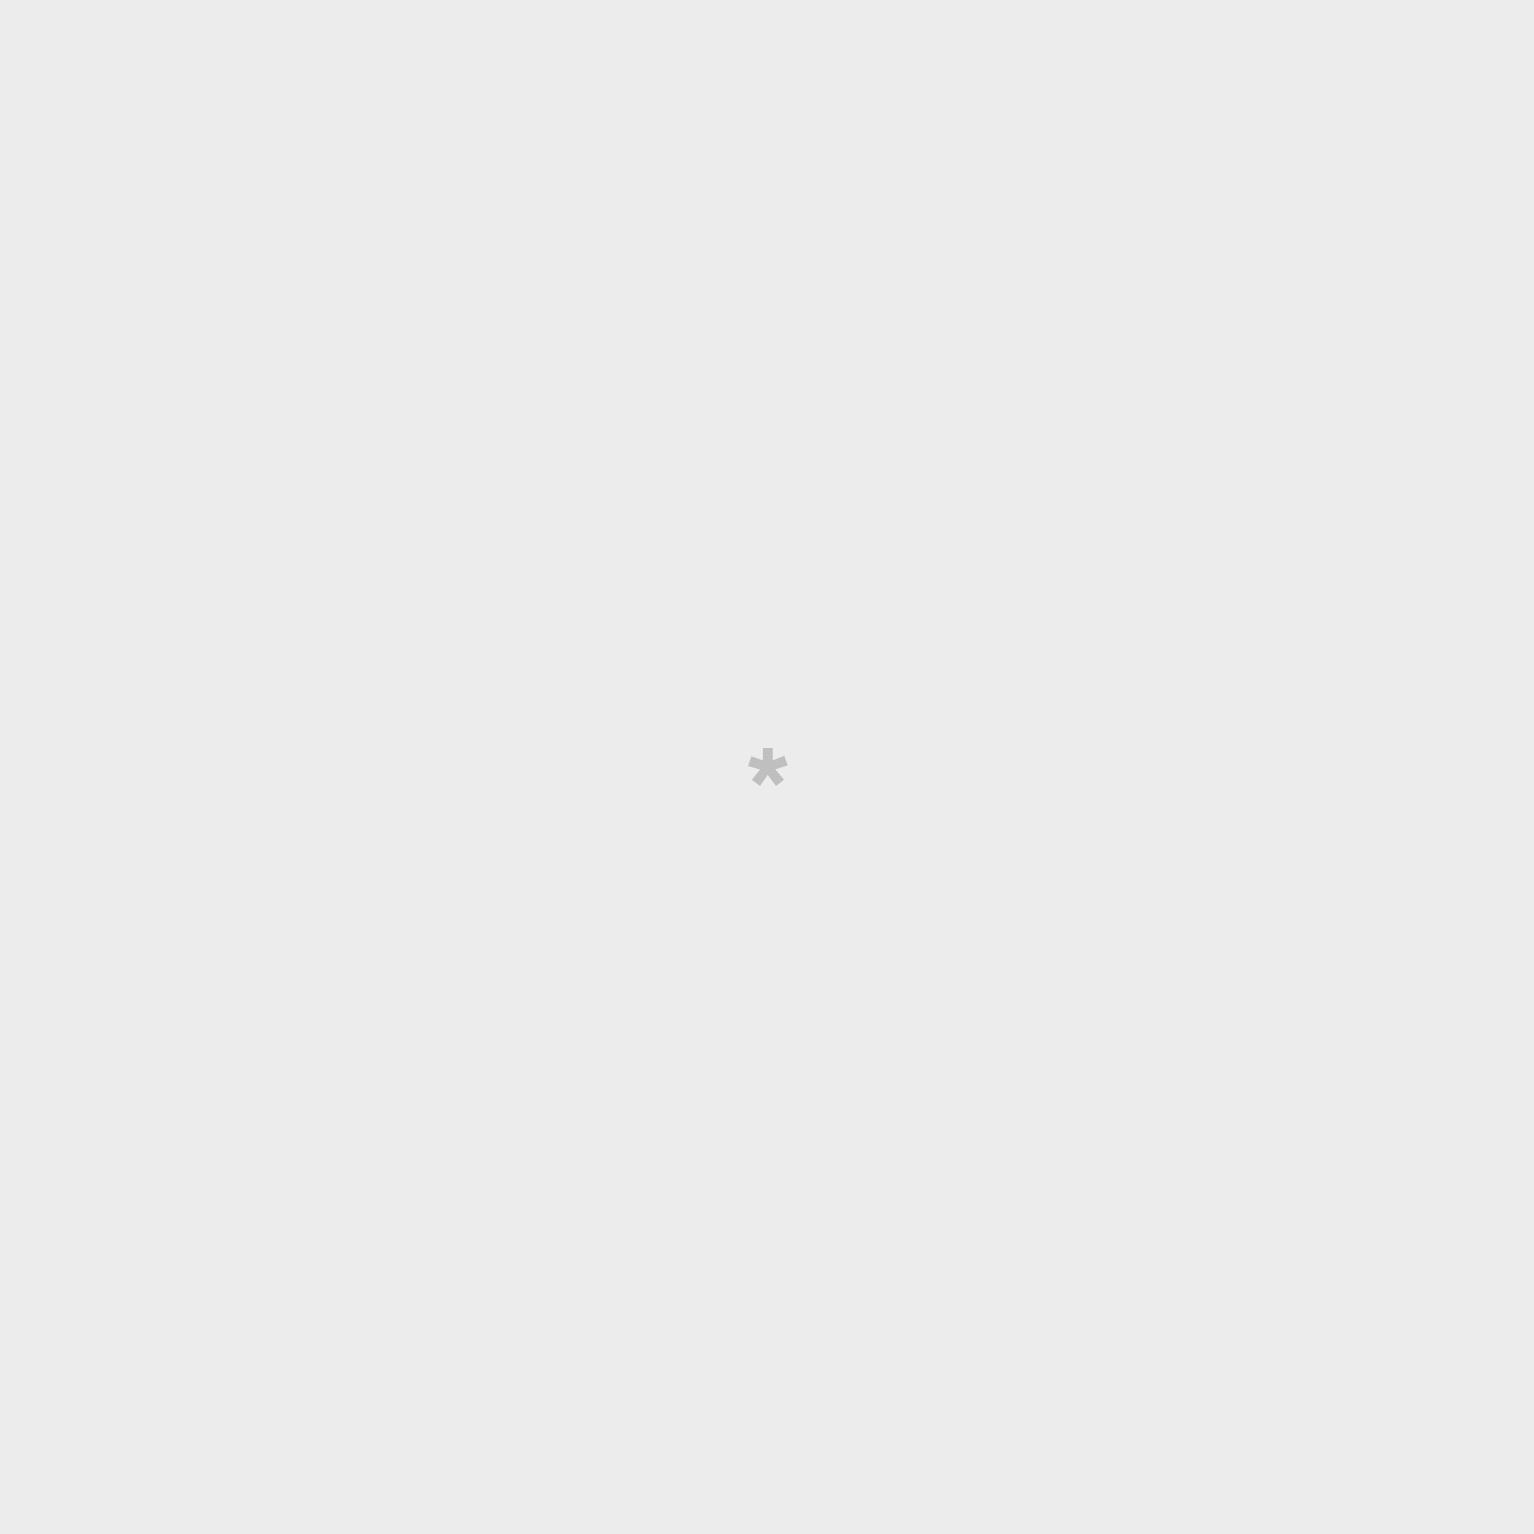 Sack bag - Go for it!